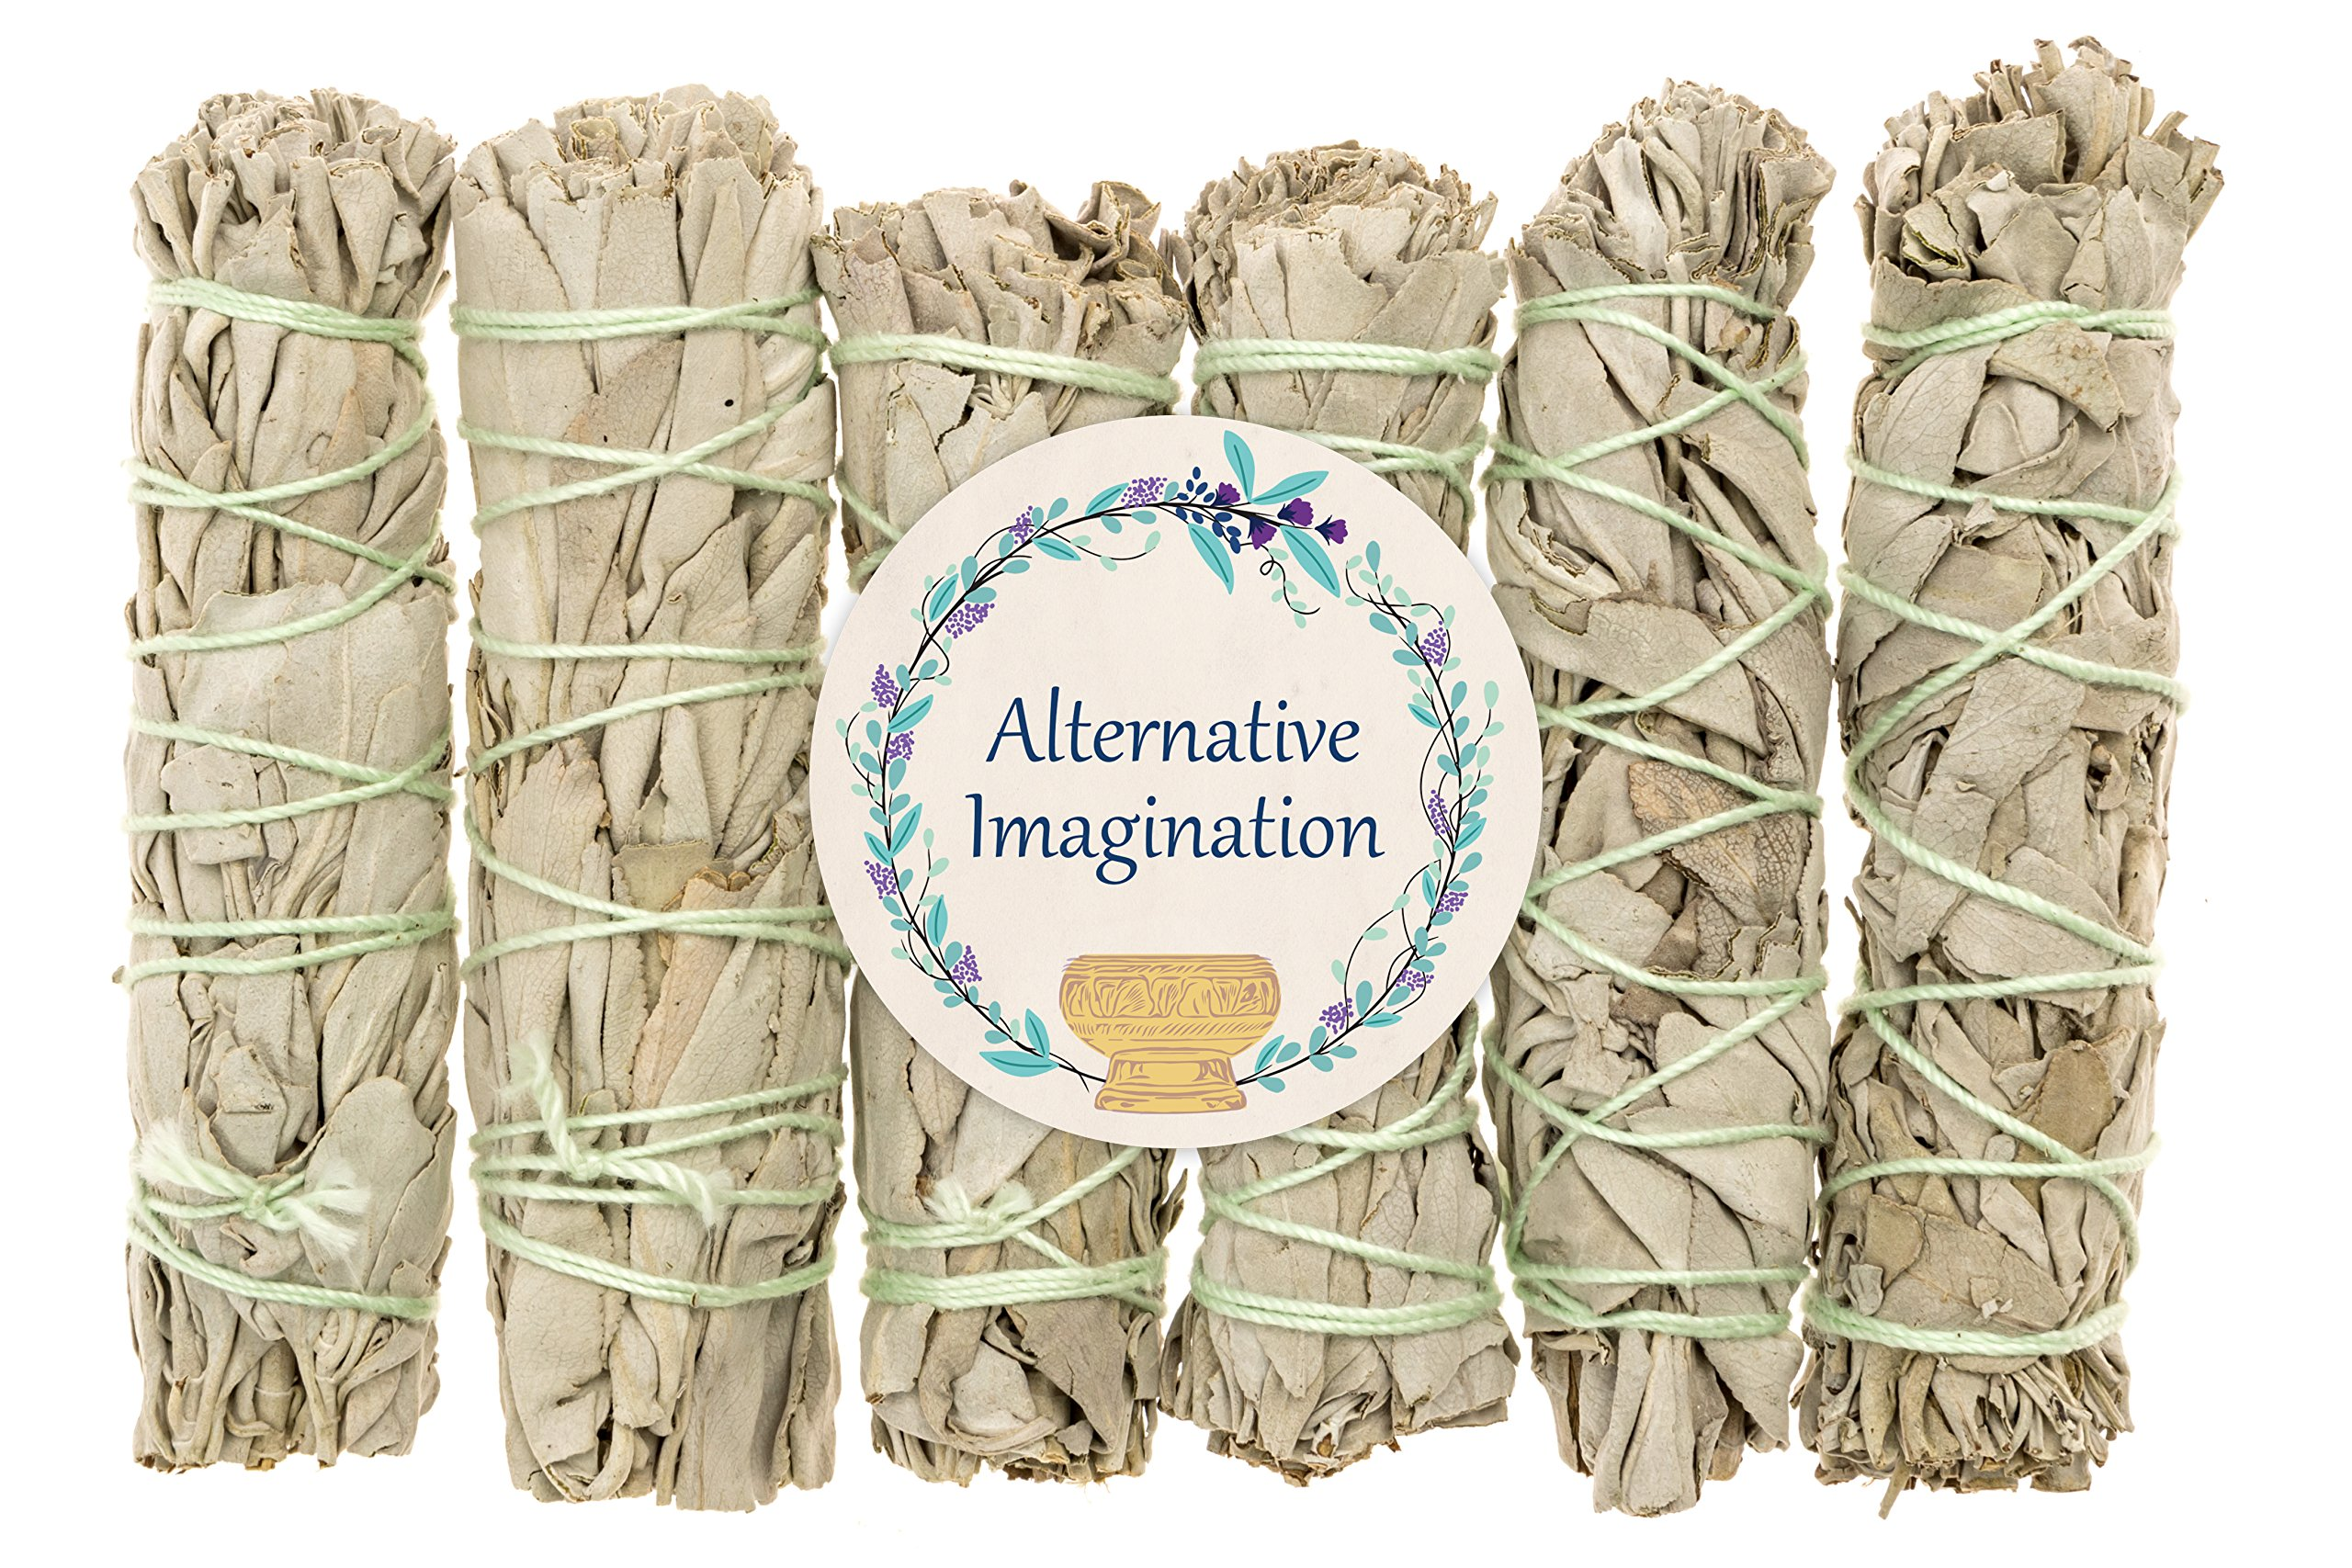 Alternative Imagination Premium California White Sage 4 Inch Smudge Sticks - 6 Pack Brand. by Alternative Imagination